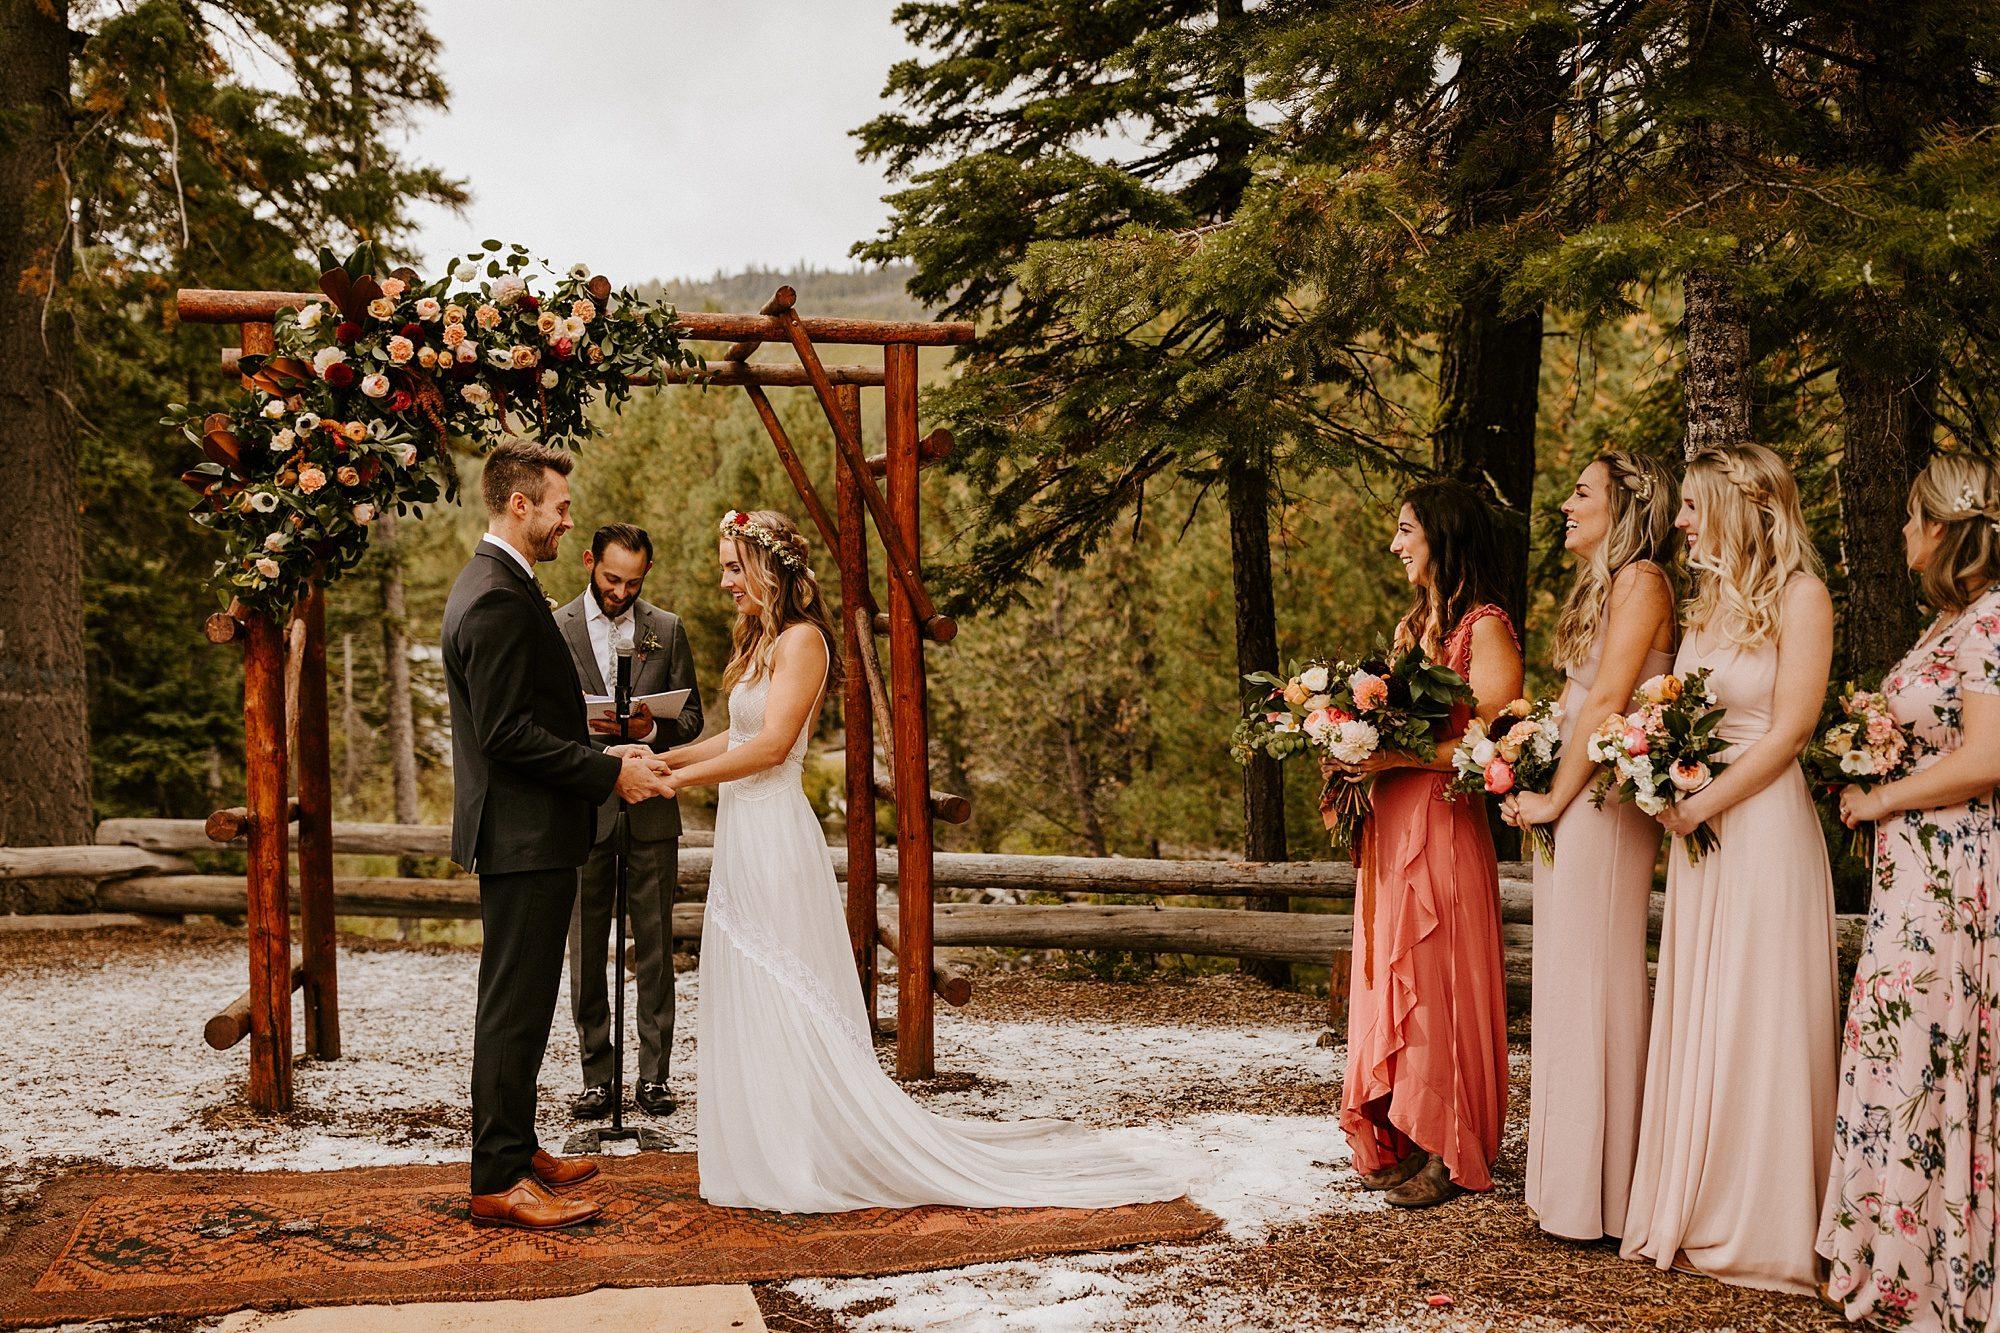 Bend Oregon Skyliner Lodge Ceremony Victoria Carlson Wedding Photographer